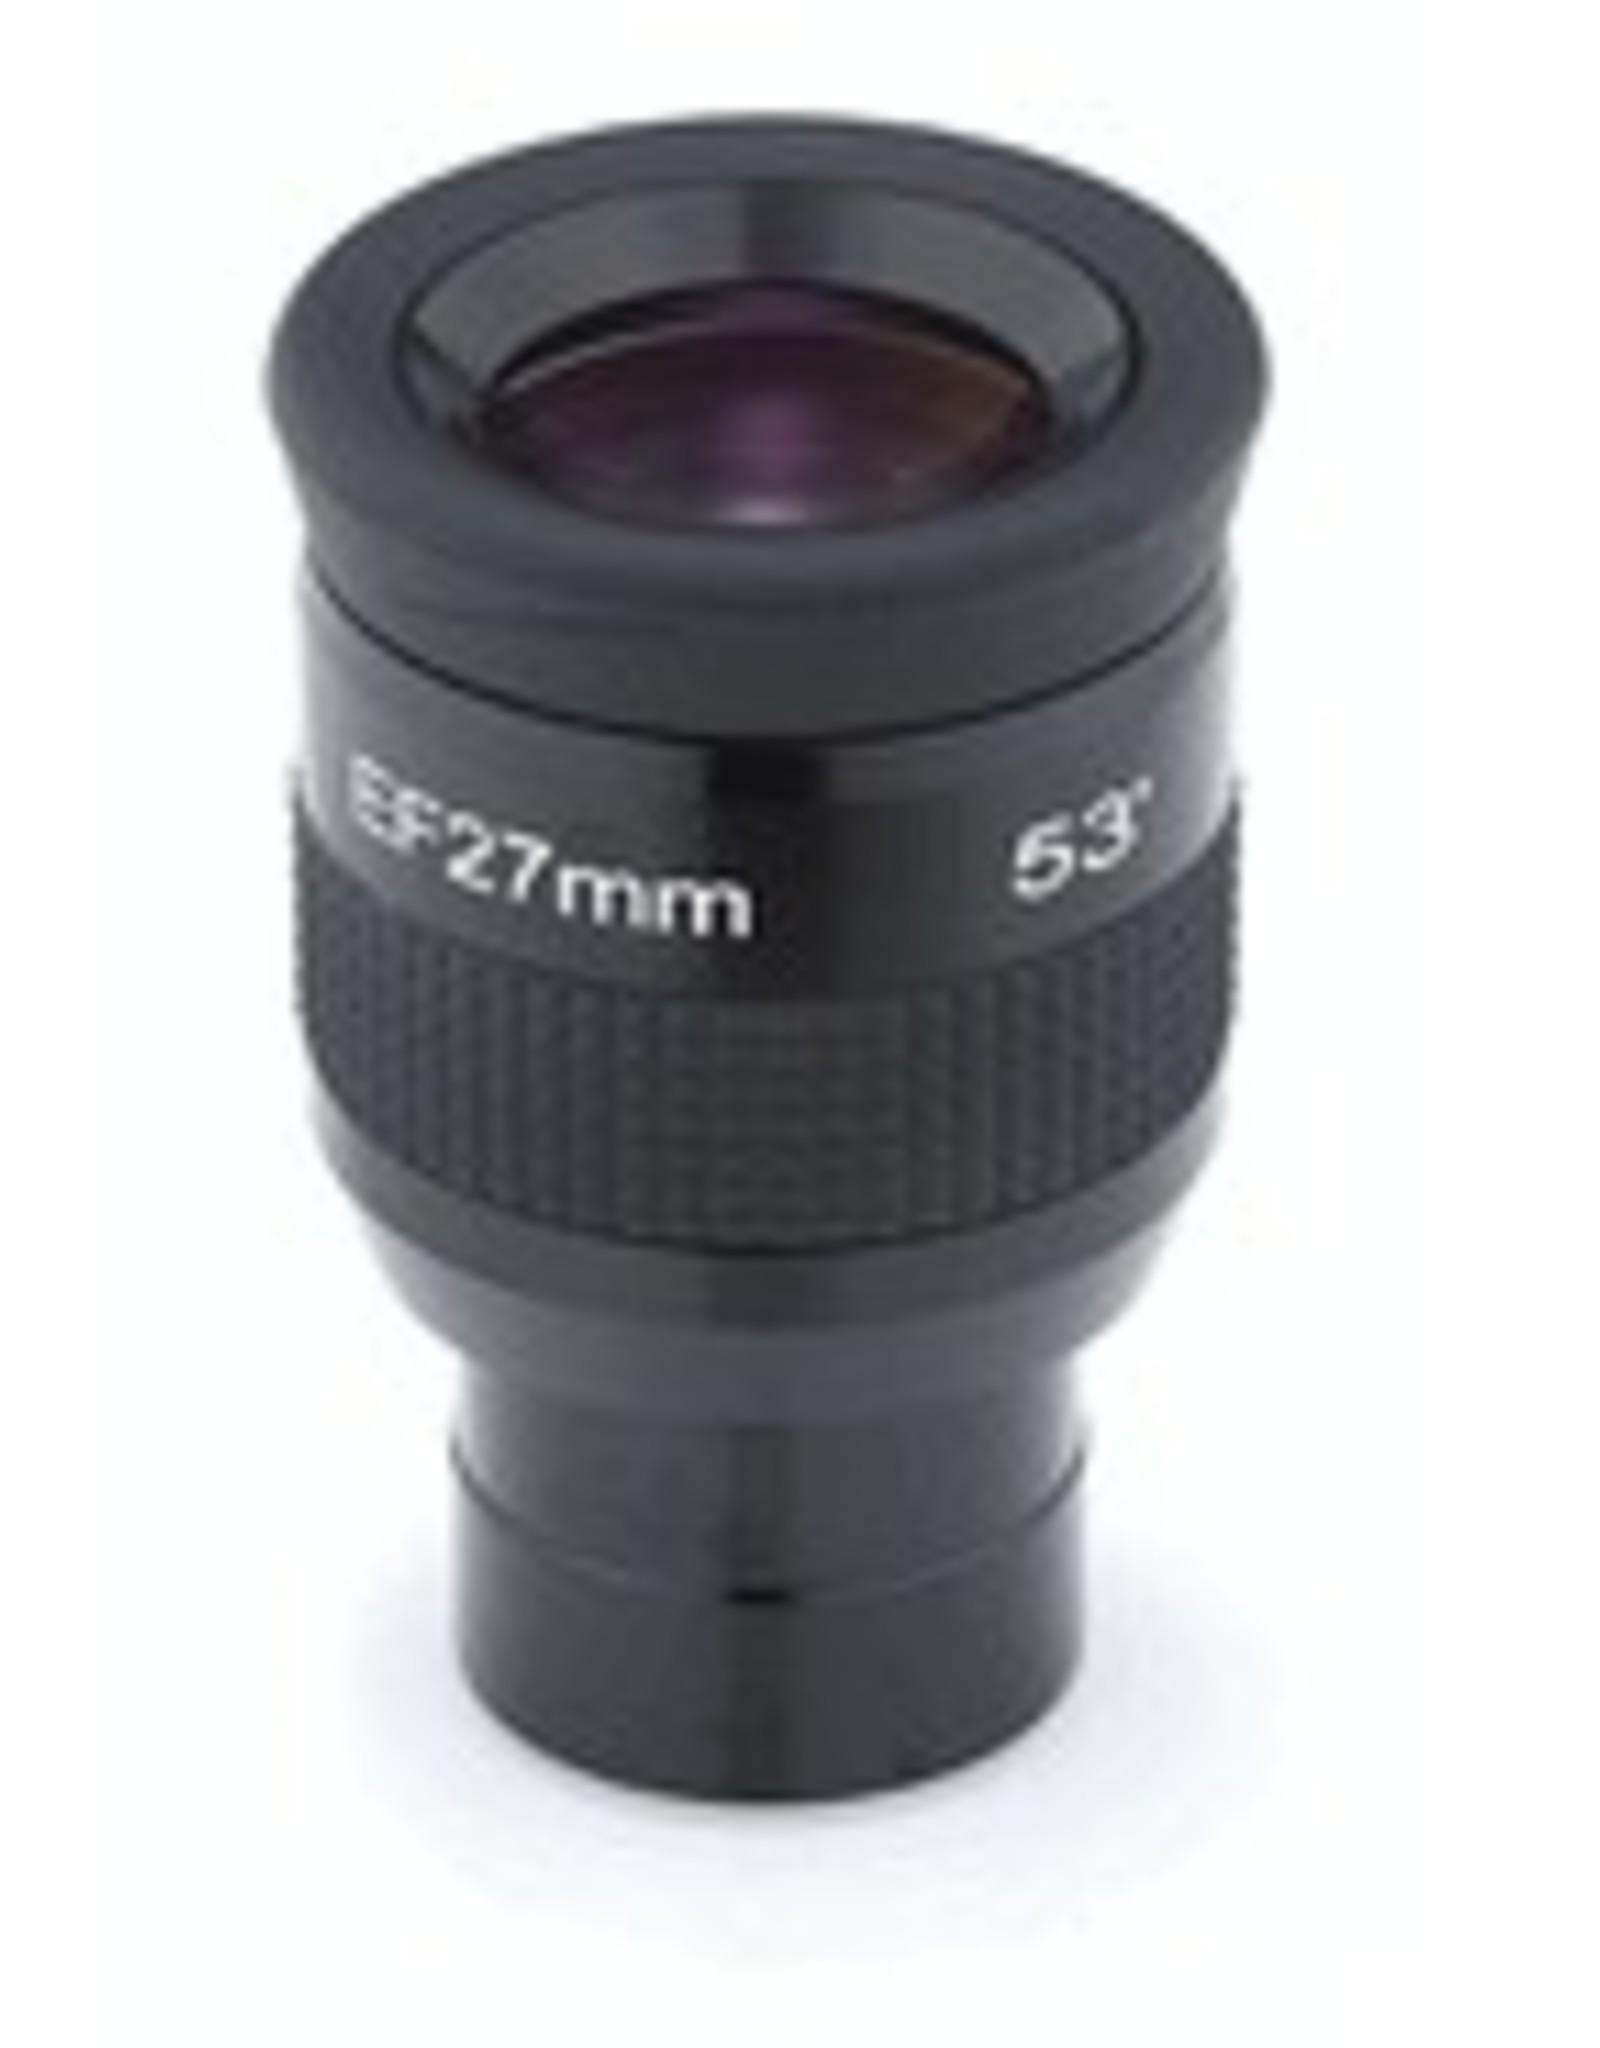 BST BST 27mm Edge On FLAT FIELD Eyepiece